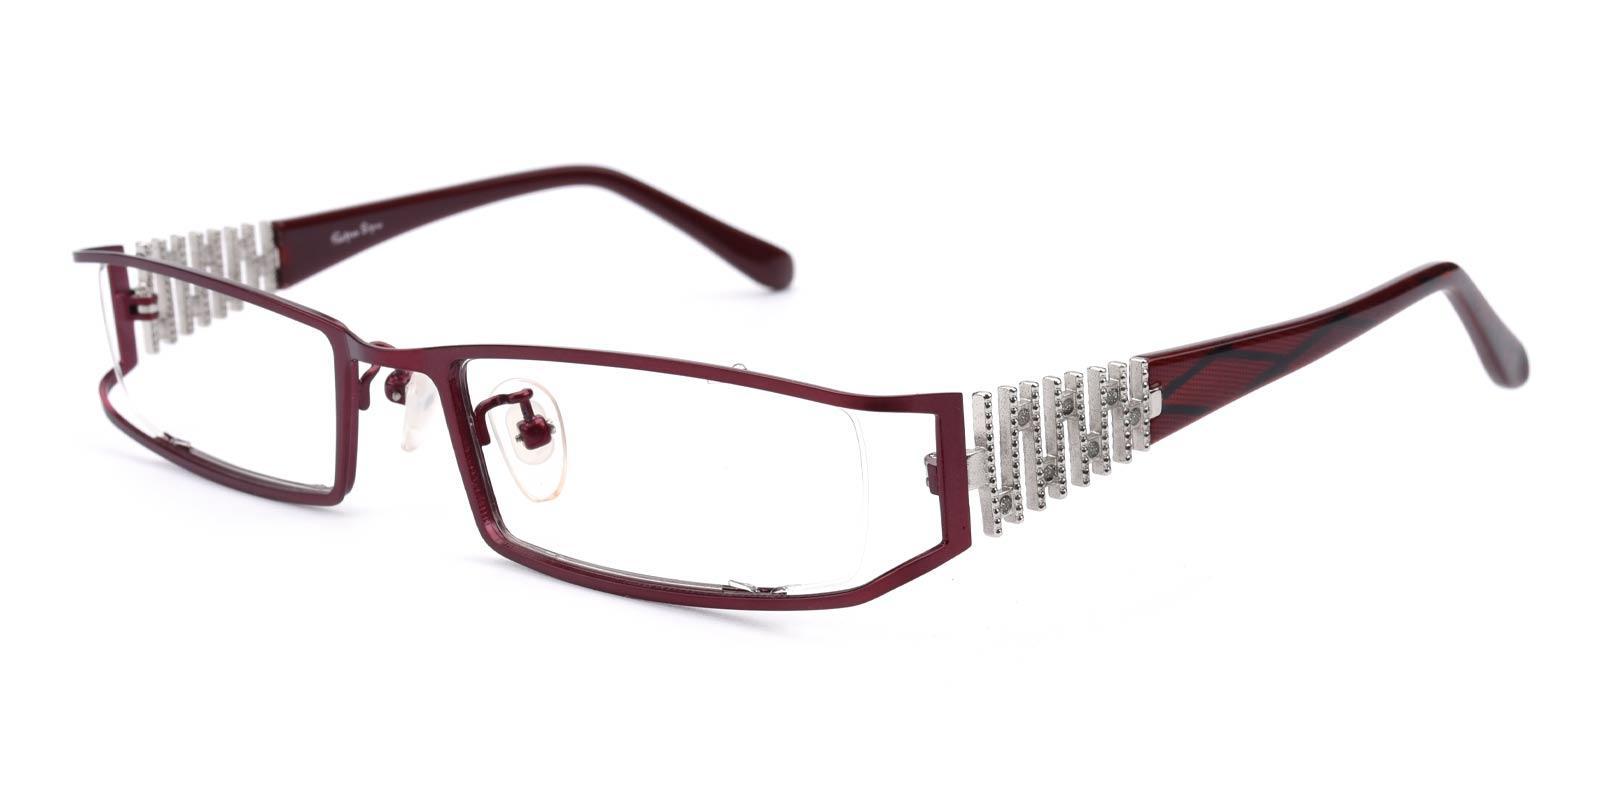 Akili-Red-Rectangle-Metal-Eyeglasses-additional1